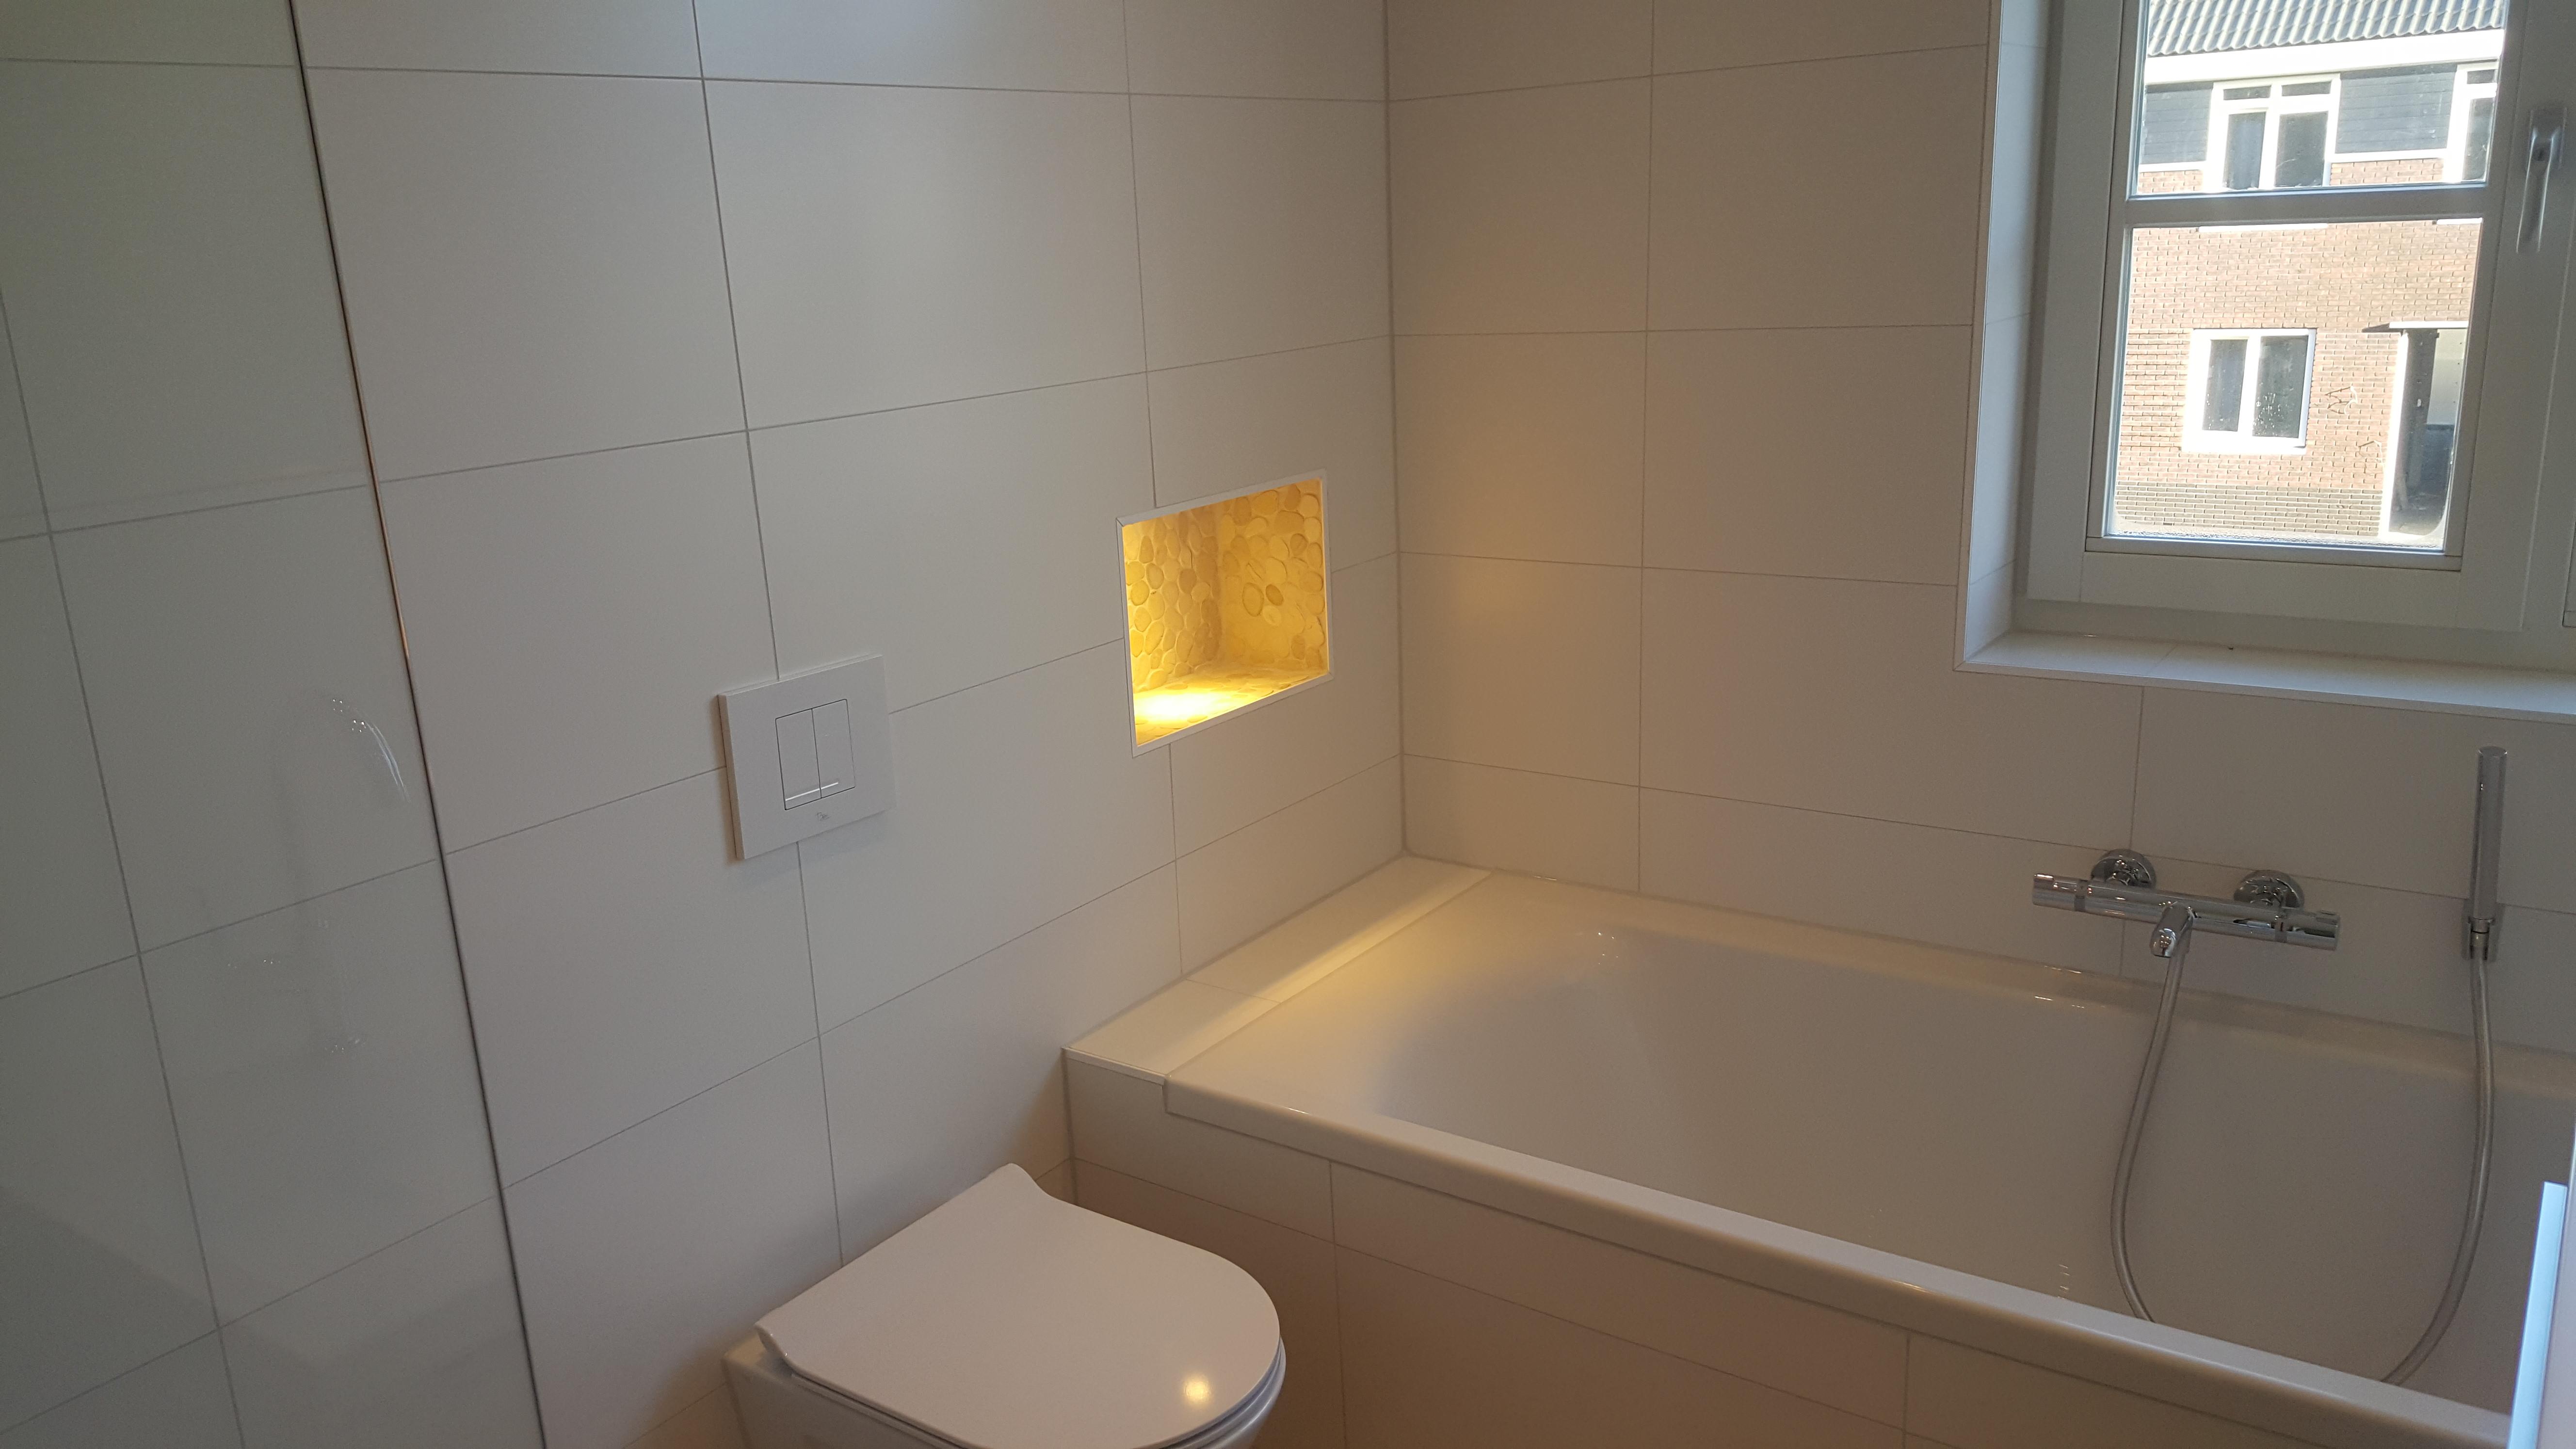 Alles voor nieuwe badkamer tegelwerk en sanitair in groningen for Hoeveel kost een nieuwe badkamer gemiddeld